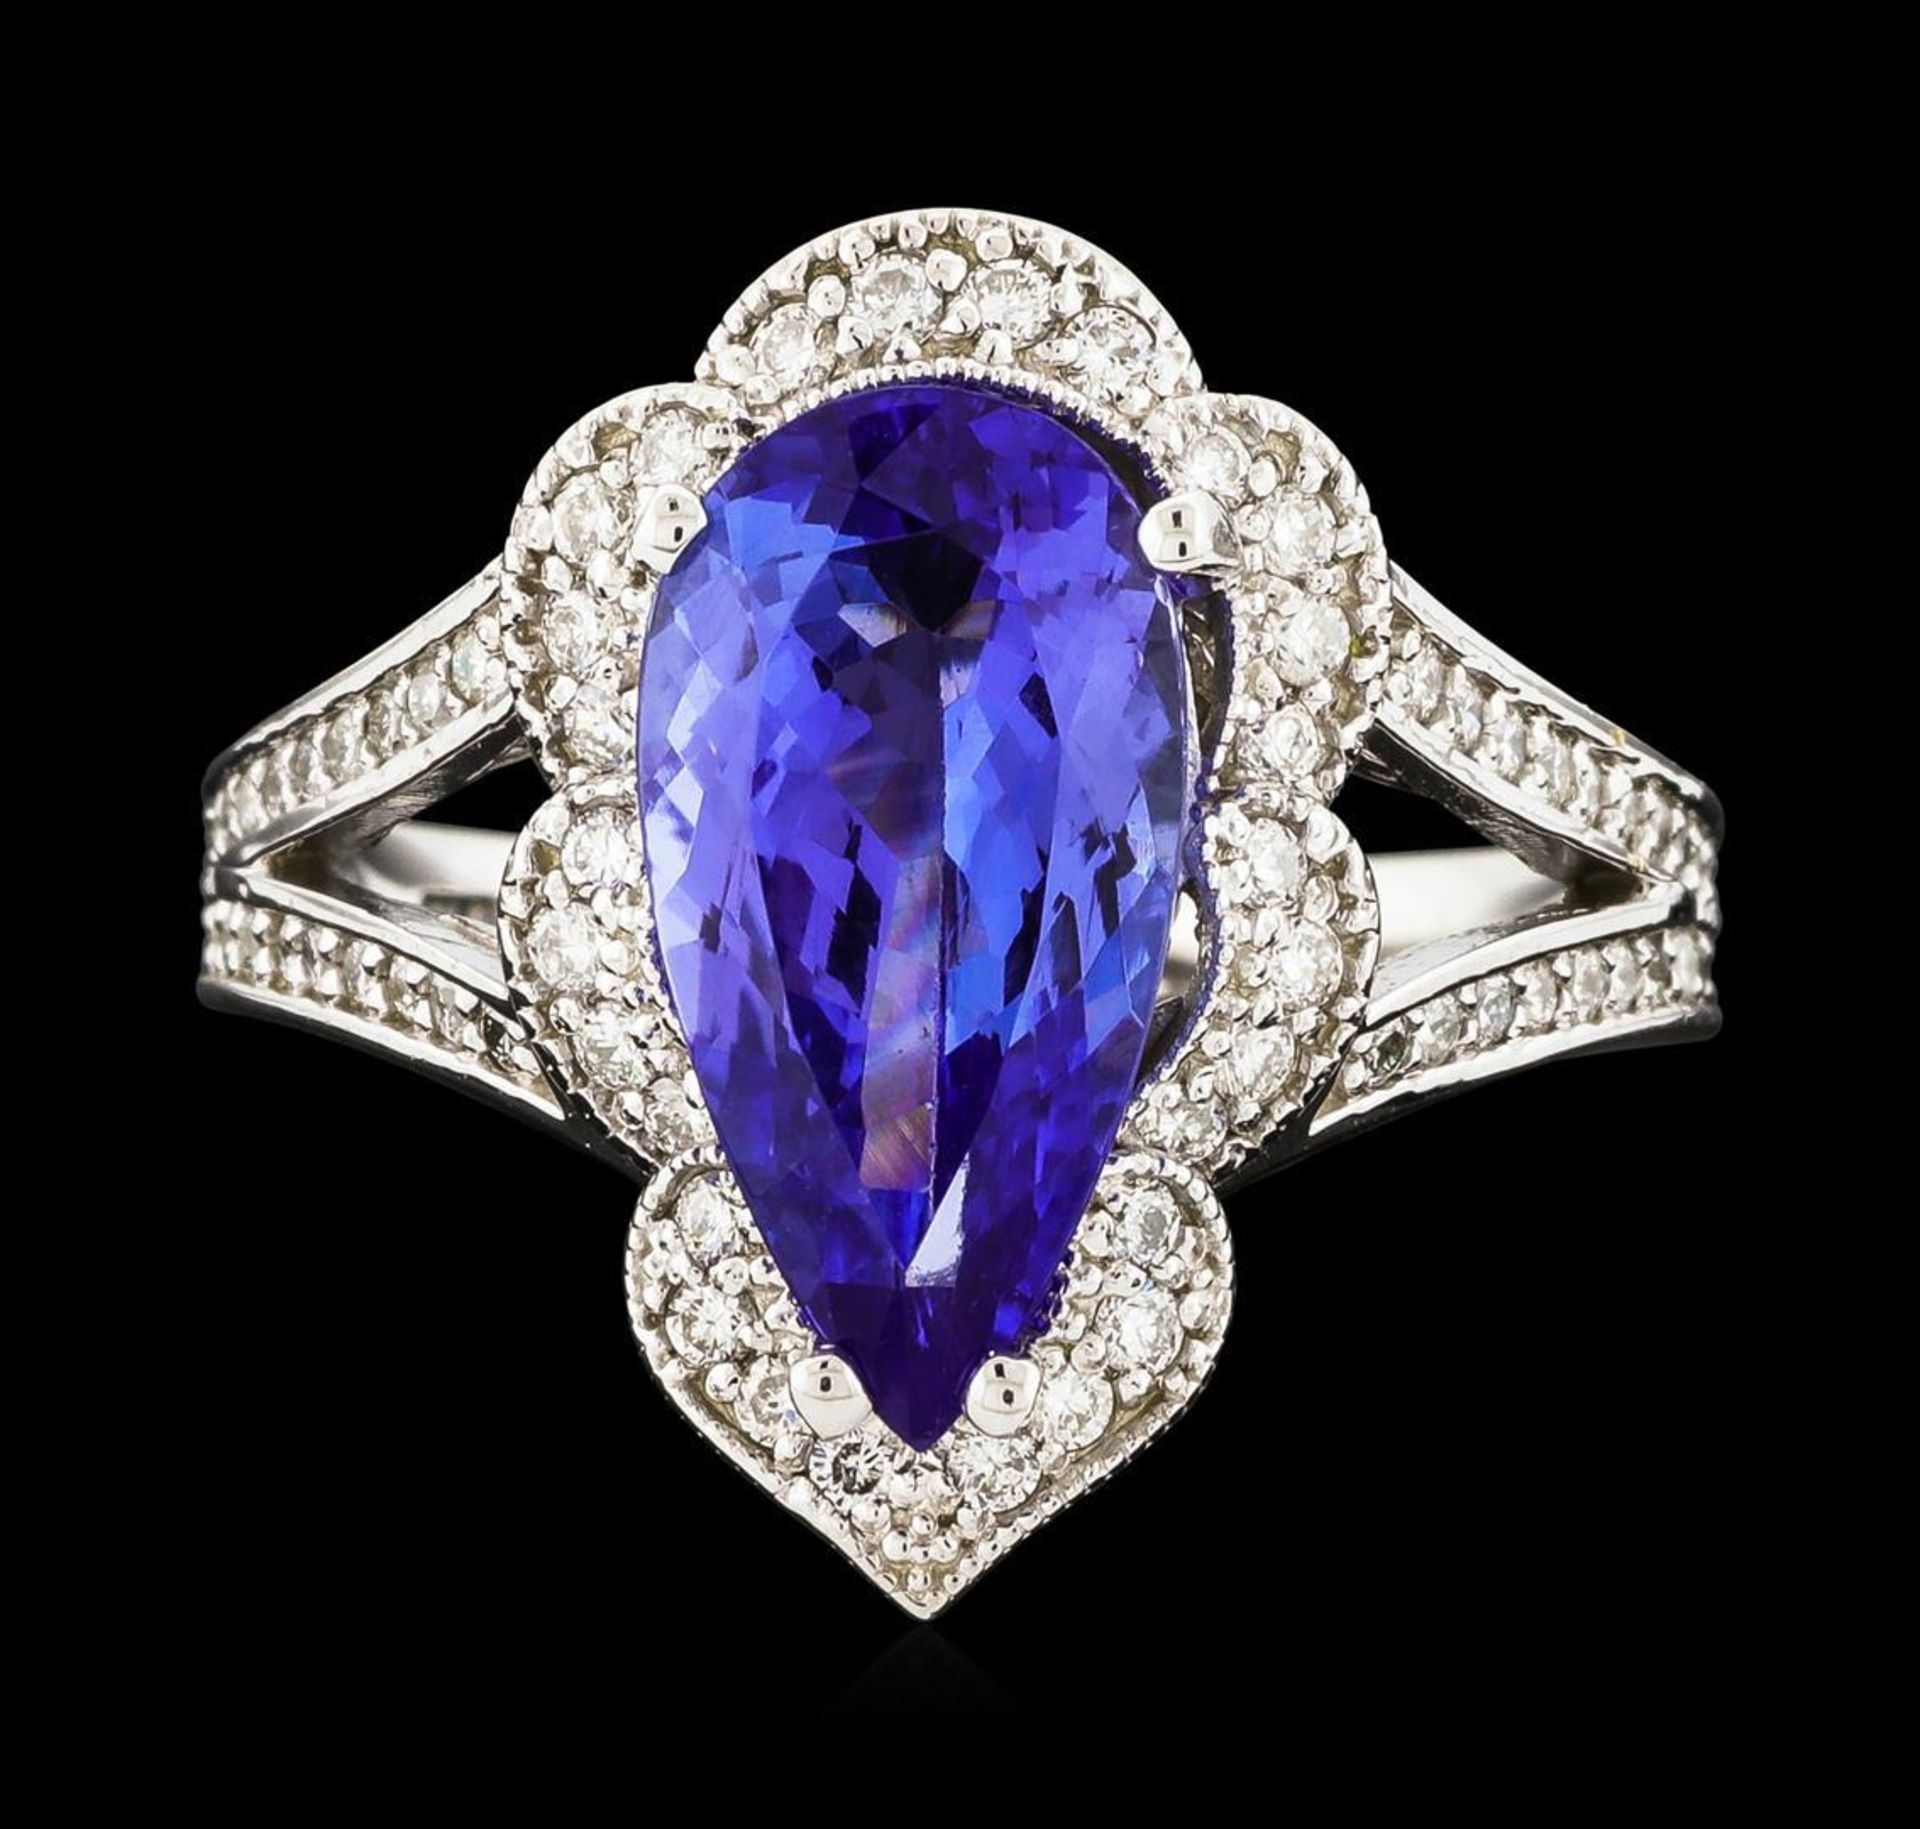 3.40 ctw Tanzanite and Diamond Ring - 14KT White Gold - Image 2 of 5